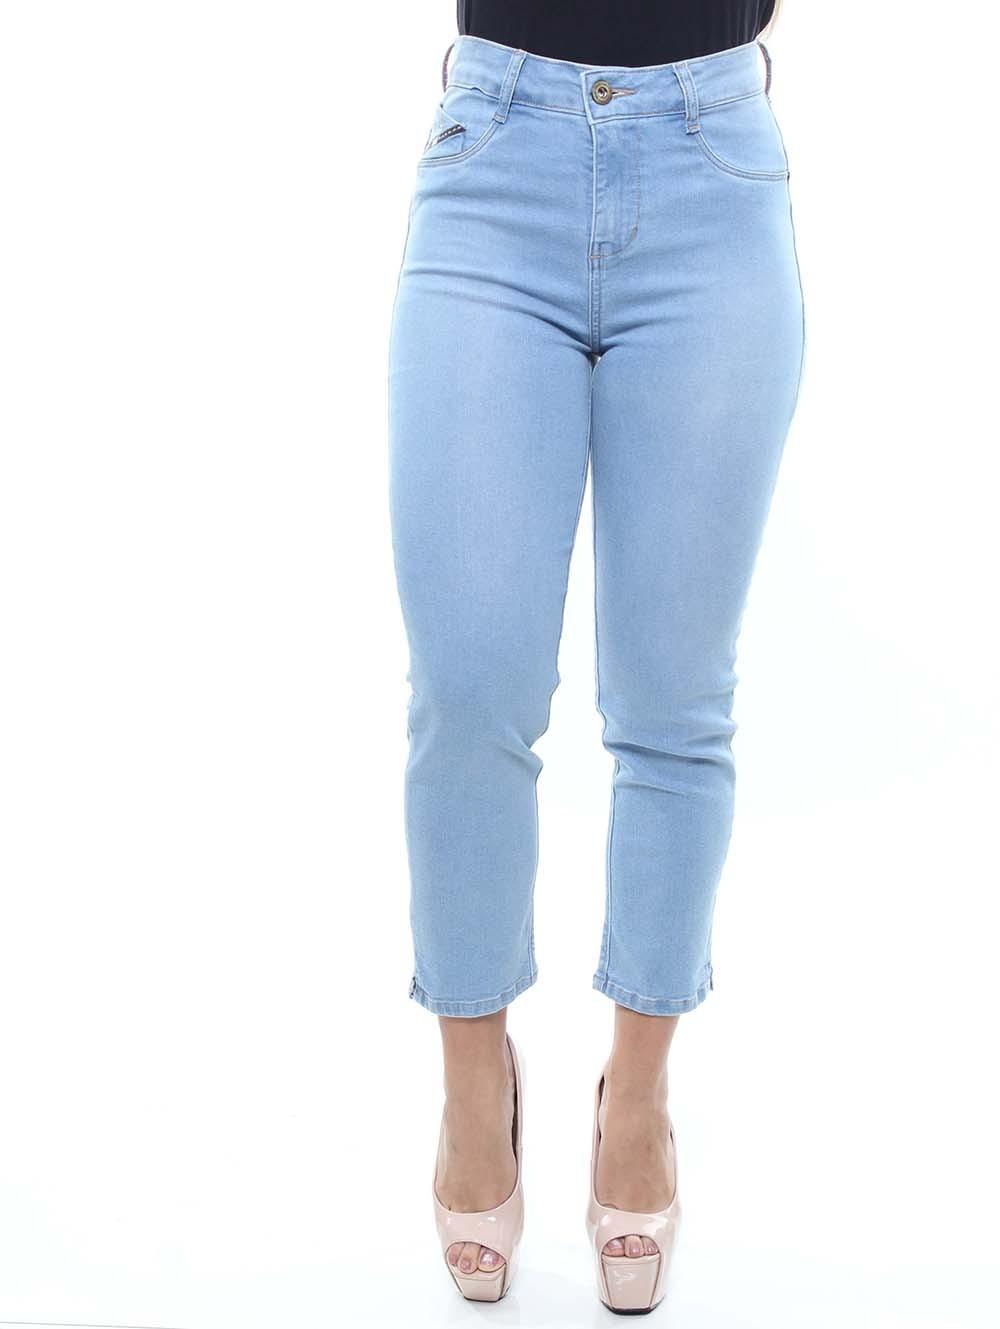 Calça Capri Jeans Feminina Crocker - 47752  - CROCKER JEANS